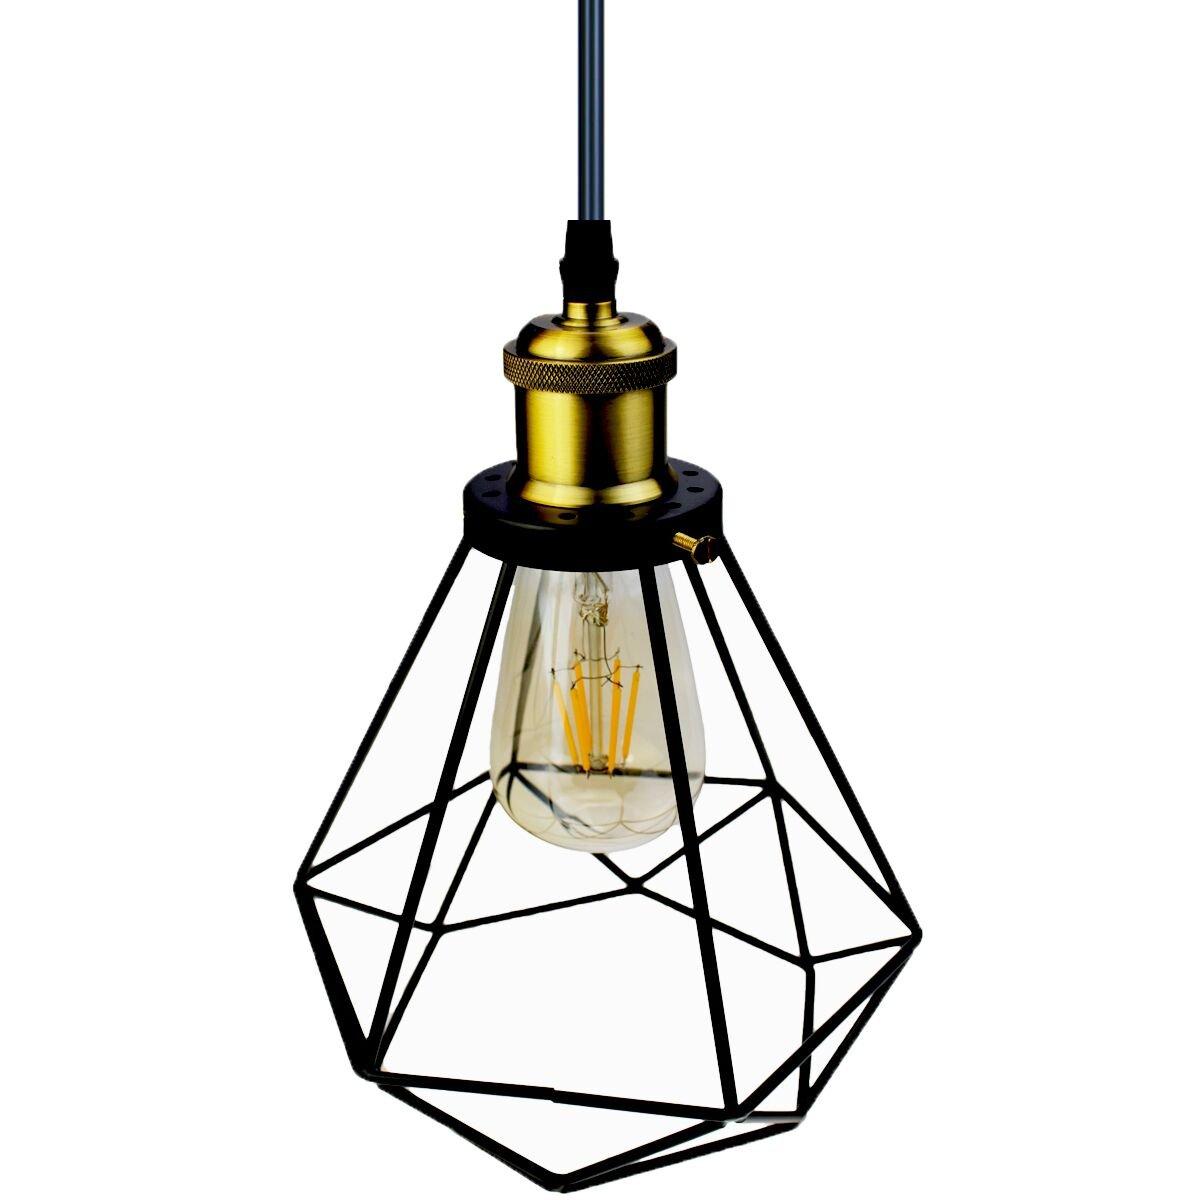 Licperron Industrial Pendant Lighting, Edison Hanging Caged Pendant Light Fixture Vintage Ceiling Lights Wire Pendant Light with Adjustable Black Cord